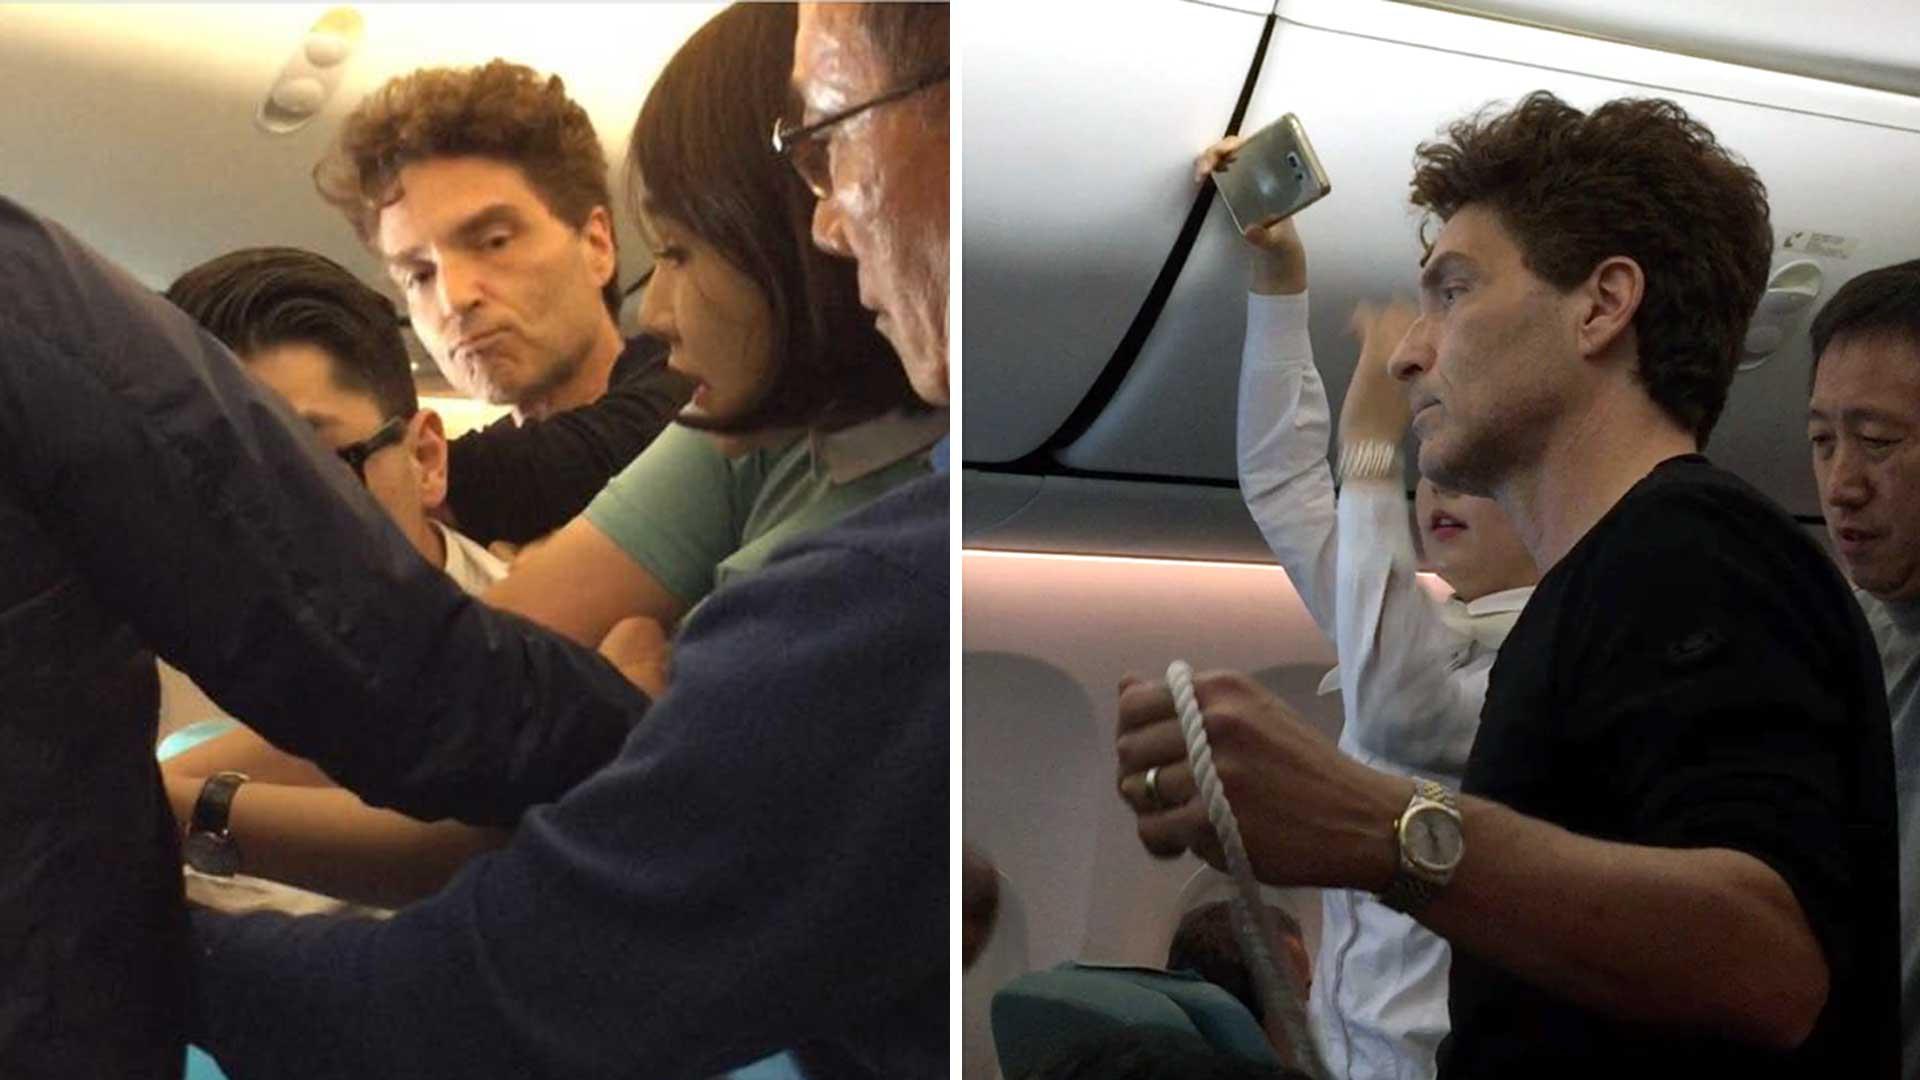 Richard Marx Helps Subdue Unruly Passenger On Korean Air